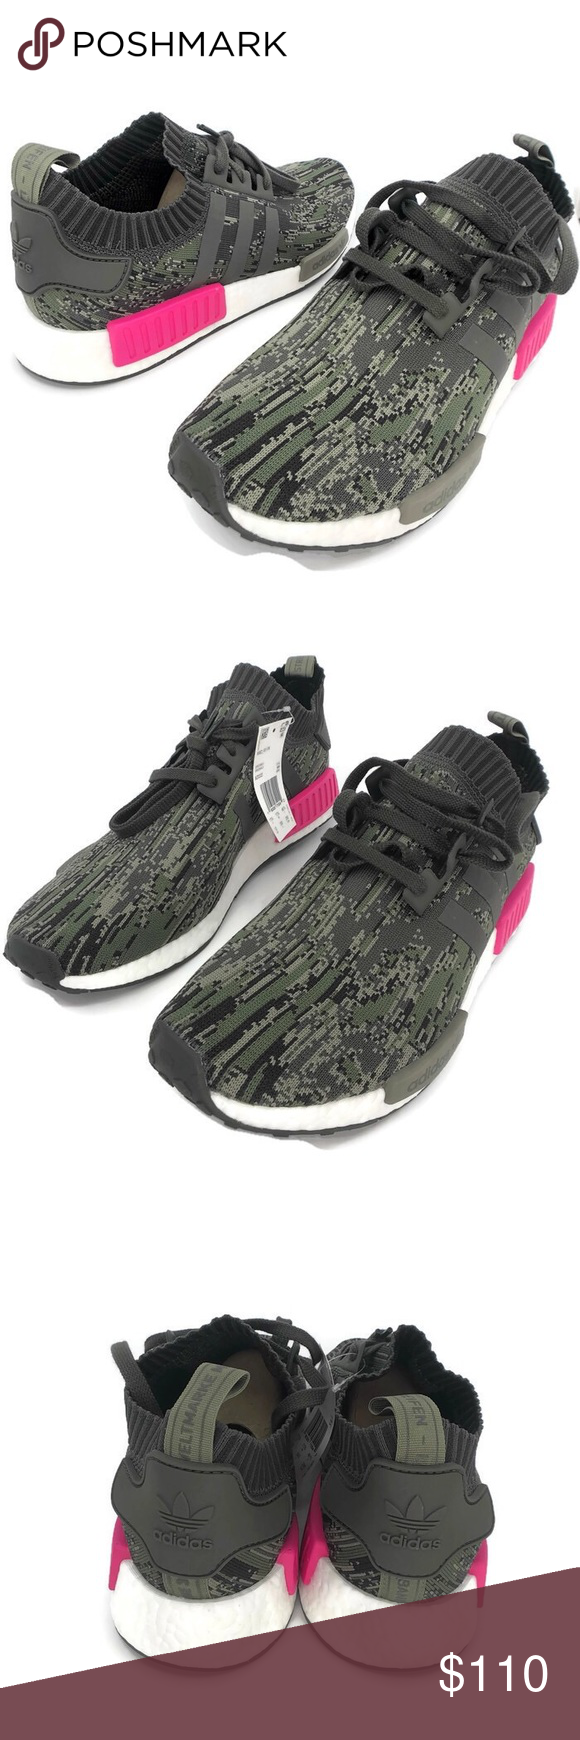 53eade96c Adidas NMD R1 PK Utility Grey Camo Shock Pink S12  NEW WITH TAGS  Adidas